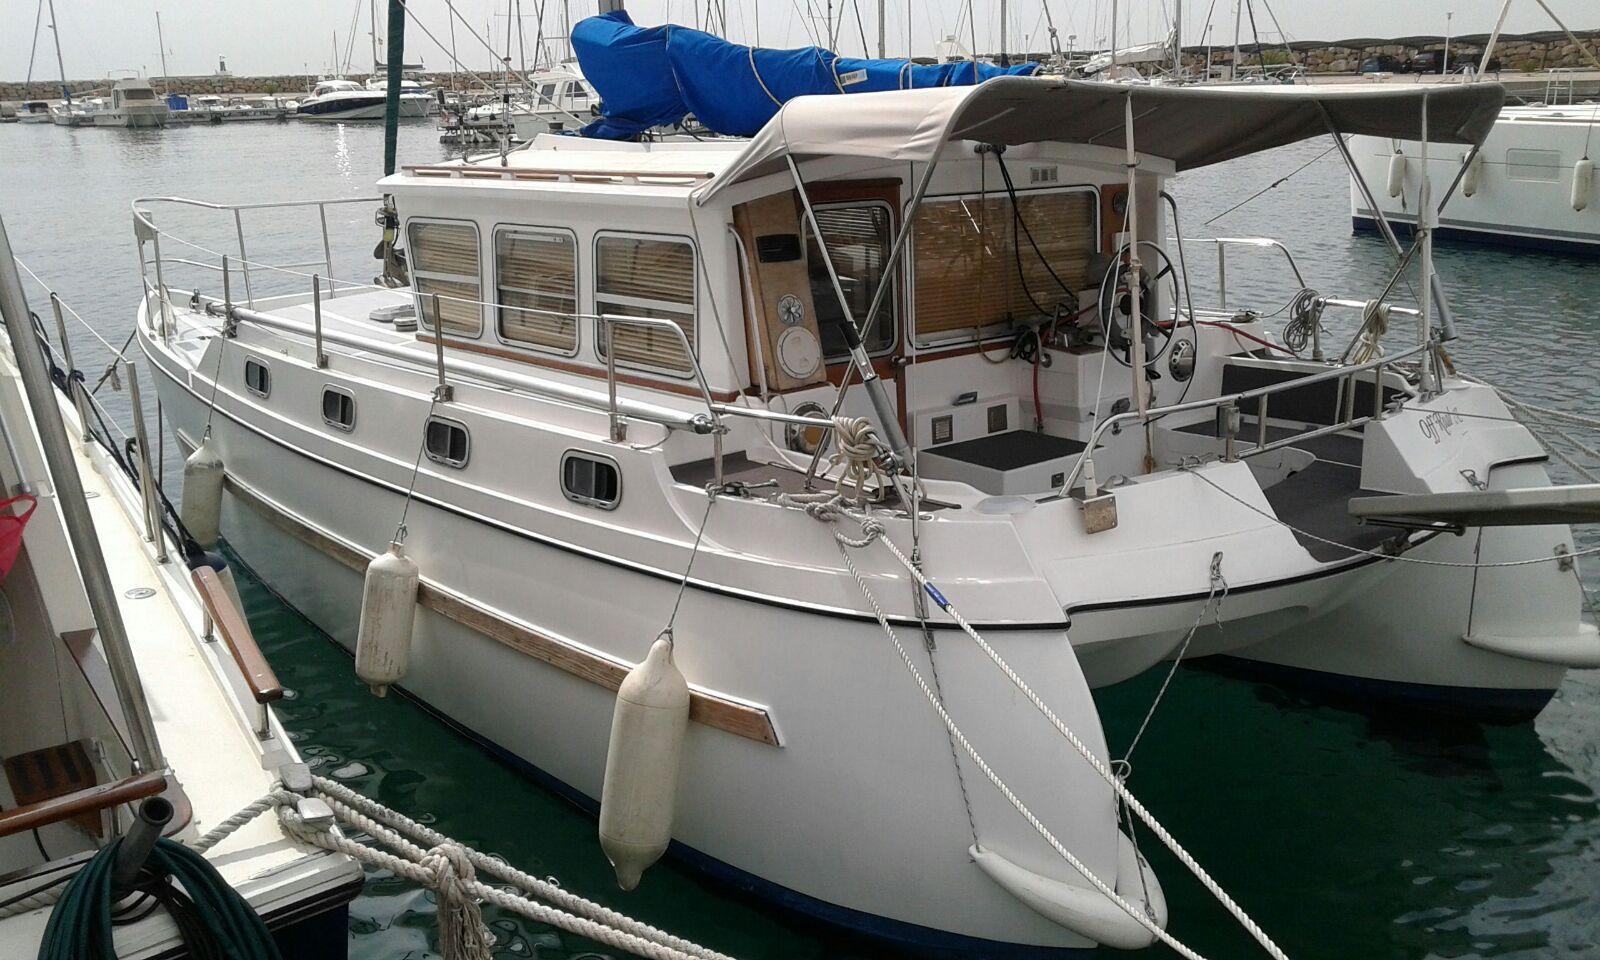 Journée bateau sur un Catamaran en rade de Marseille